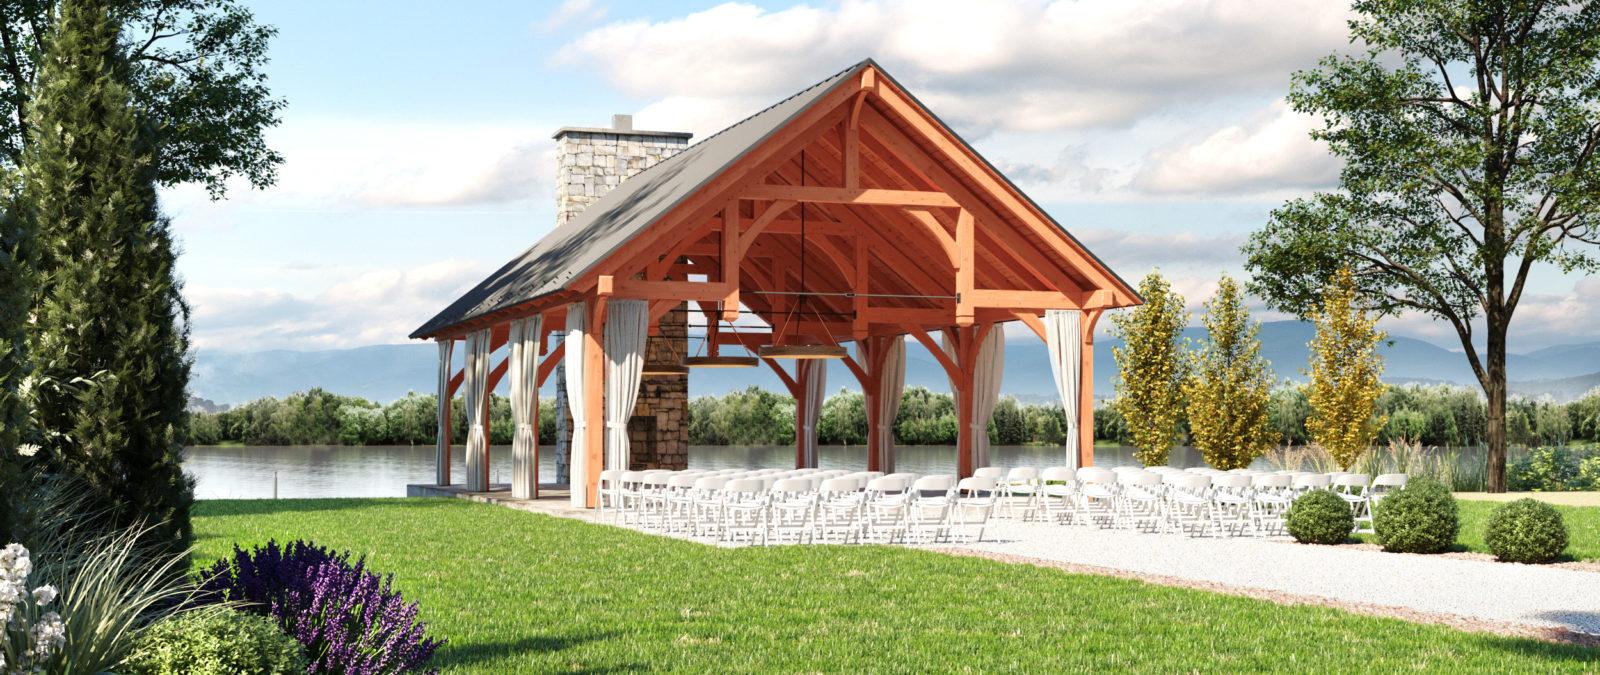 denali timber frame outdoor pavilions